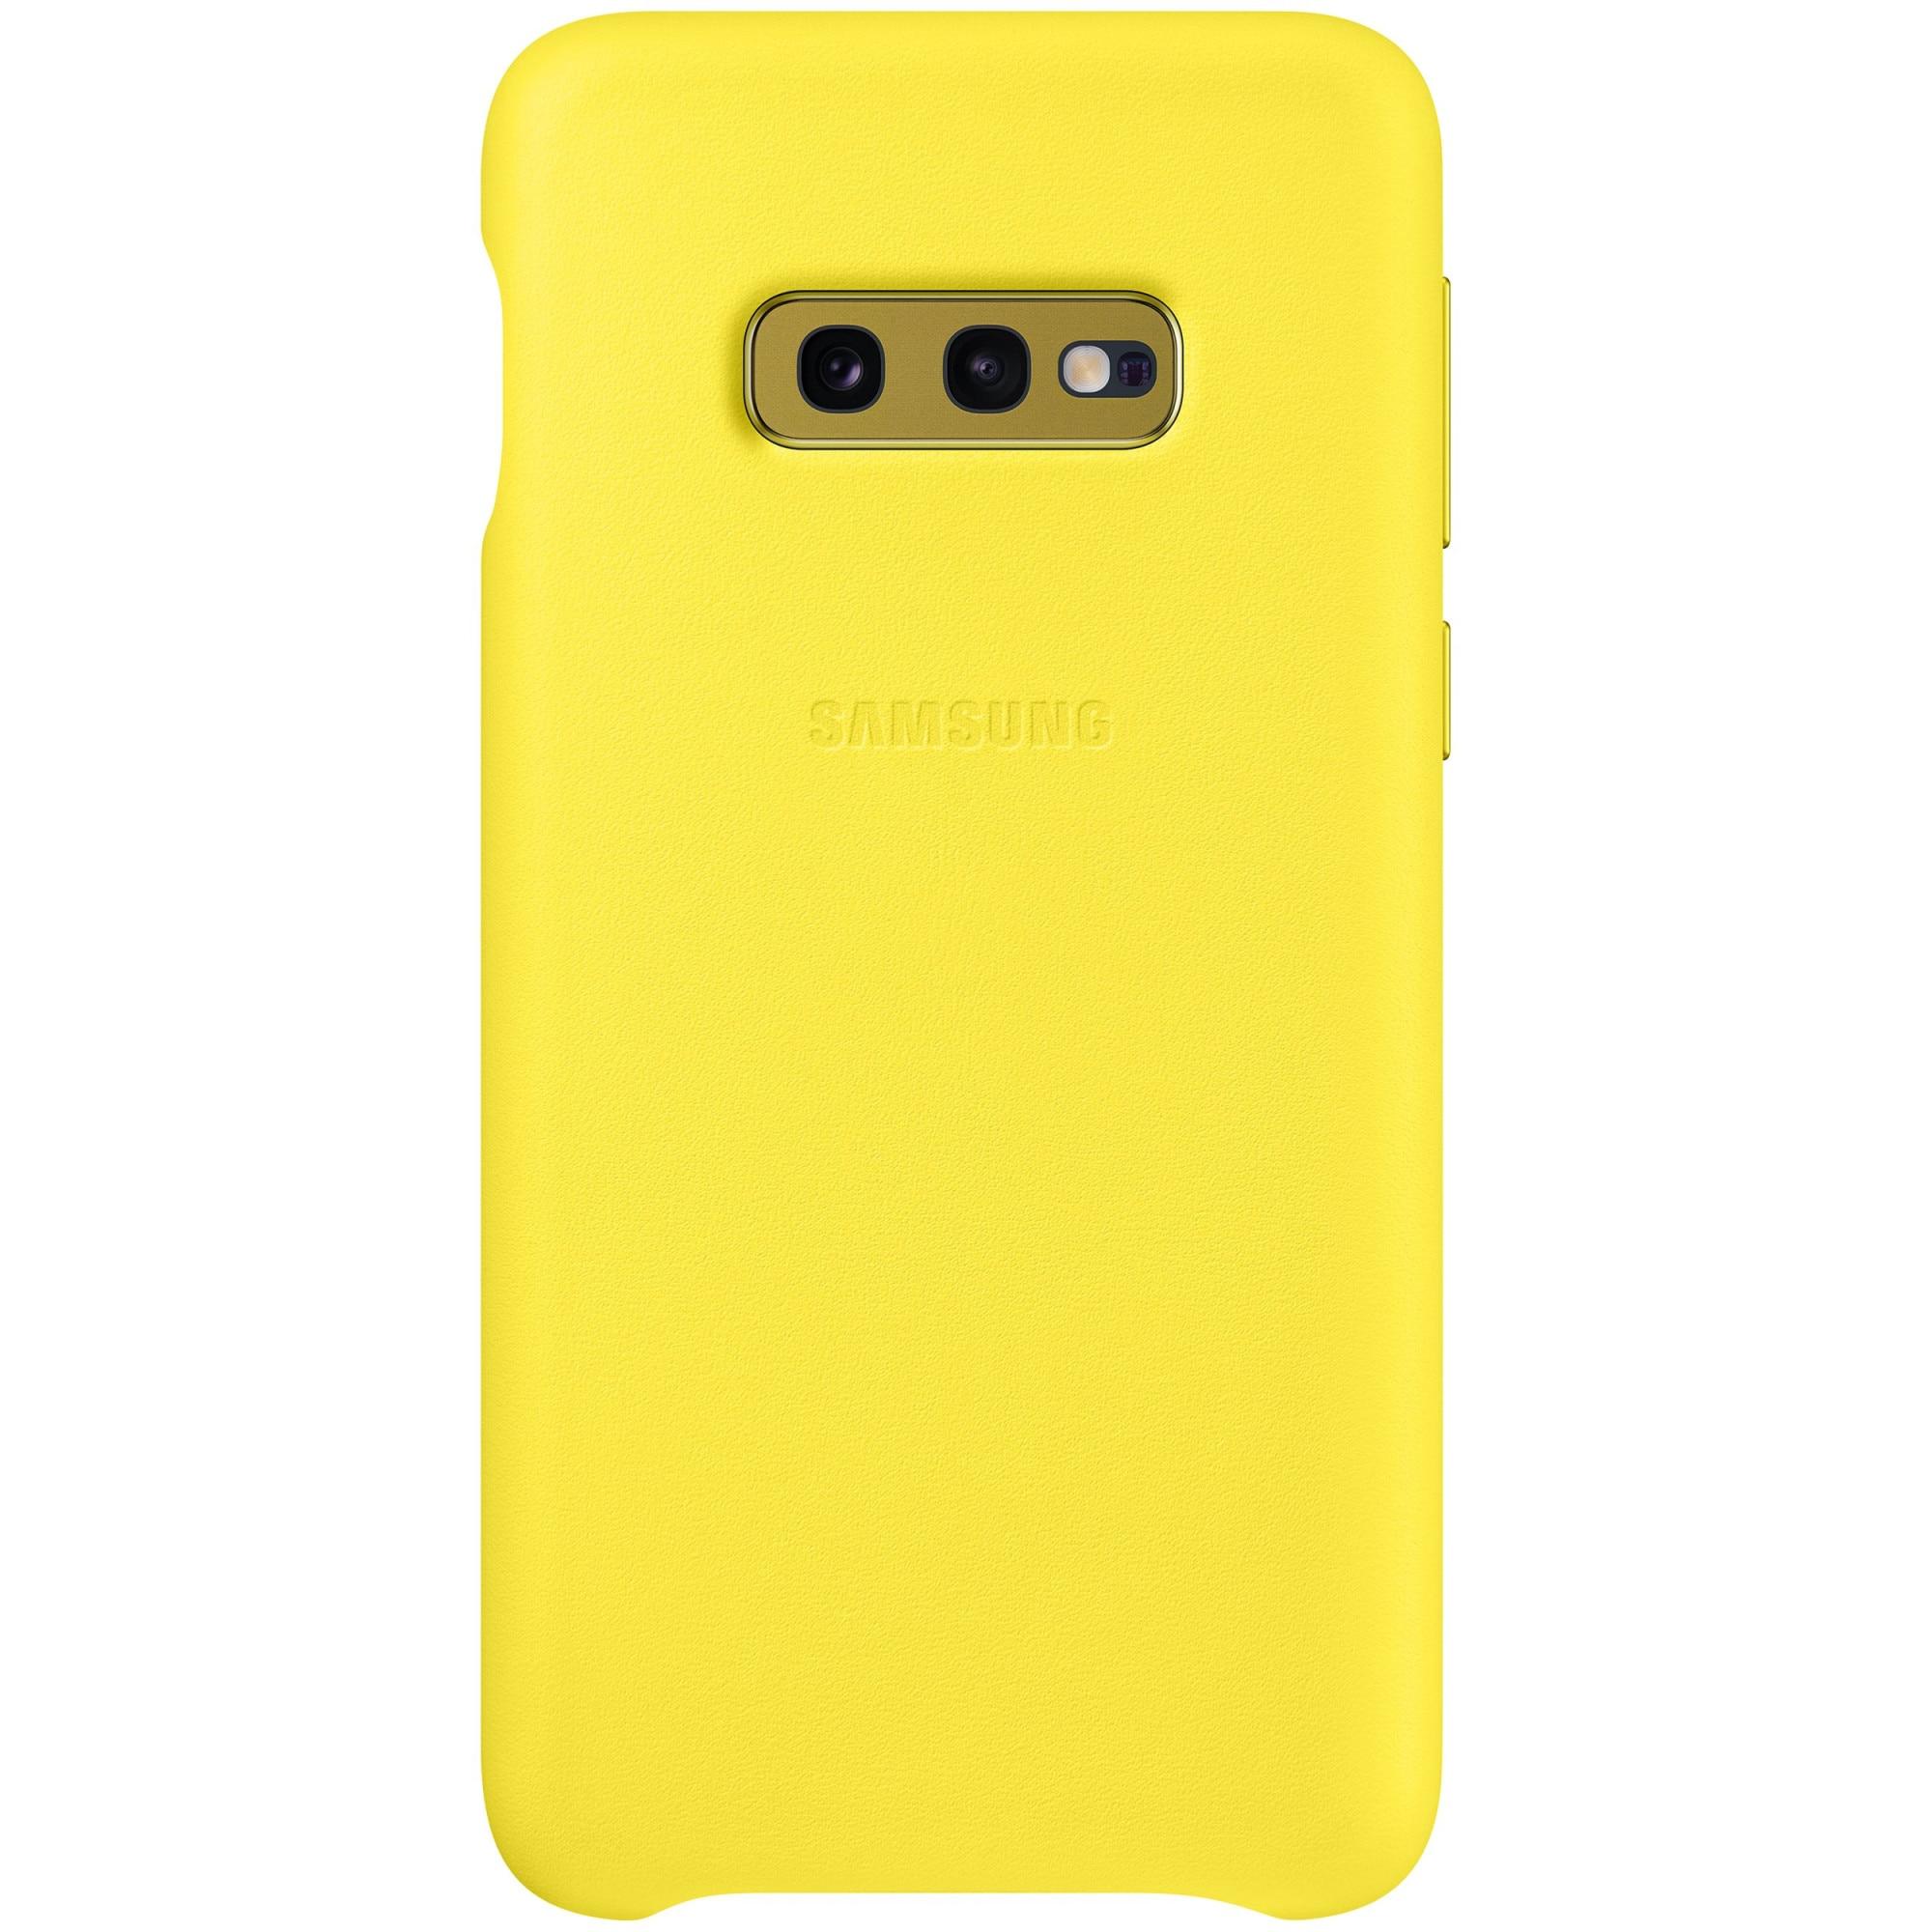 Fotografie Husa de protectie Samsung Leather pentru Galaxy S10e G970, Yellow